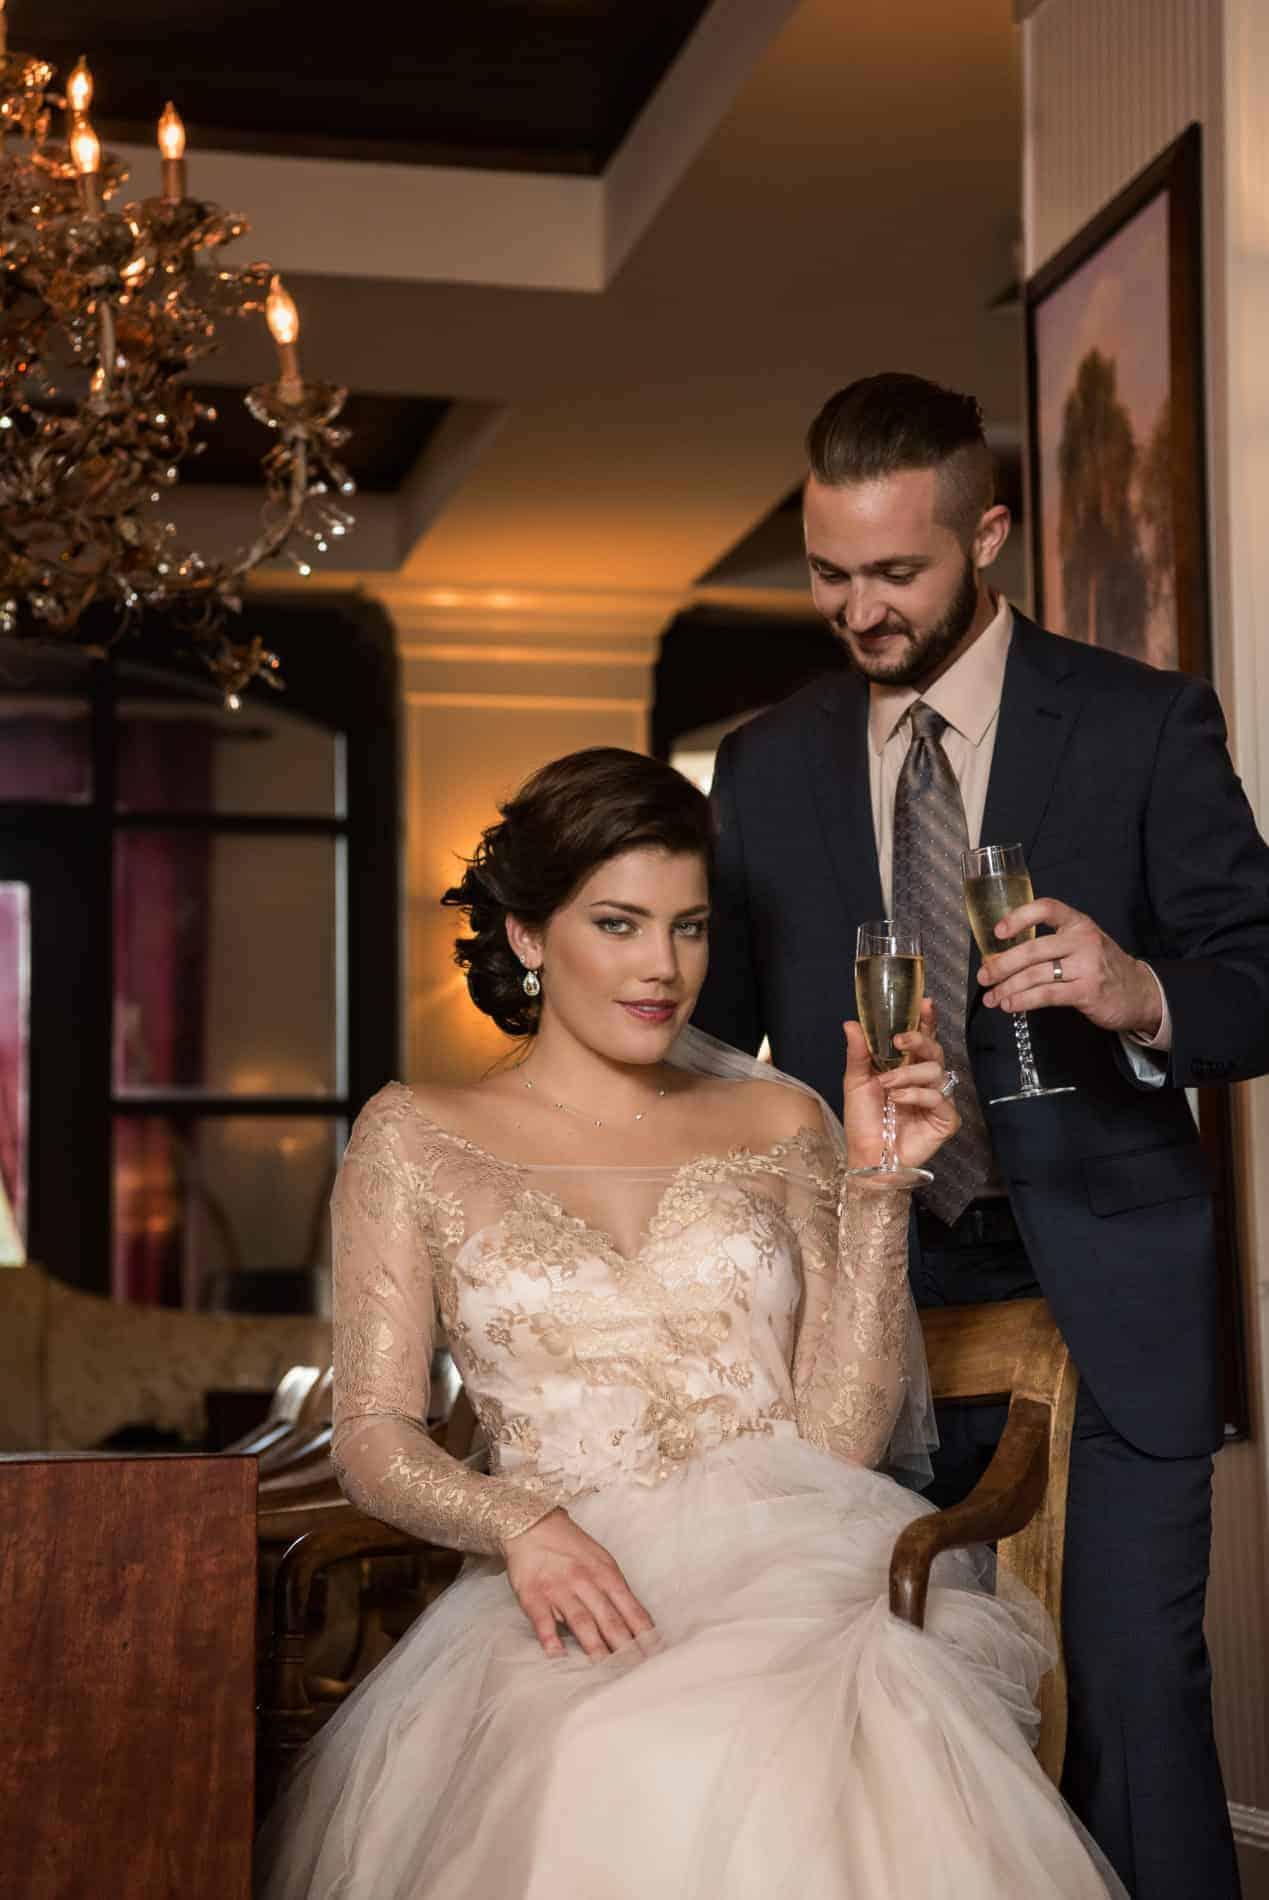 Beautiful Bride Magazine Covershoot at Bohemian Hotel Celebration with Old Charm Style